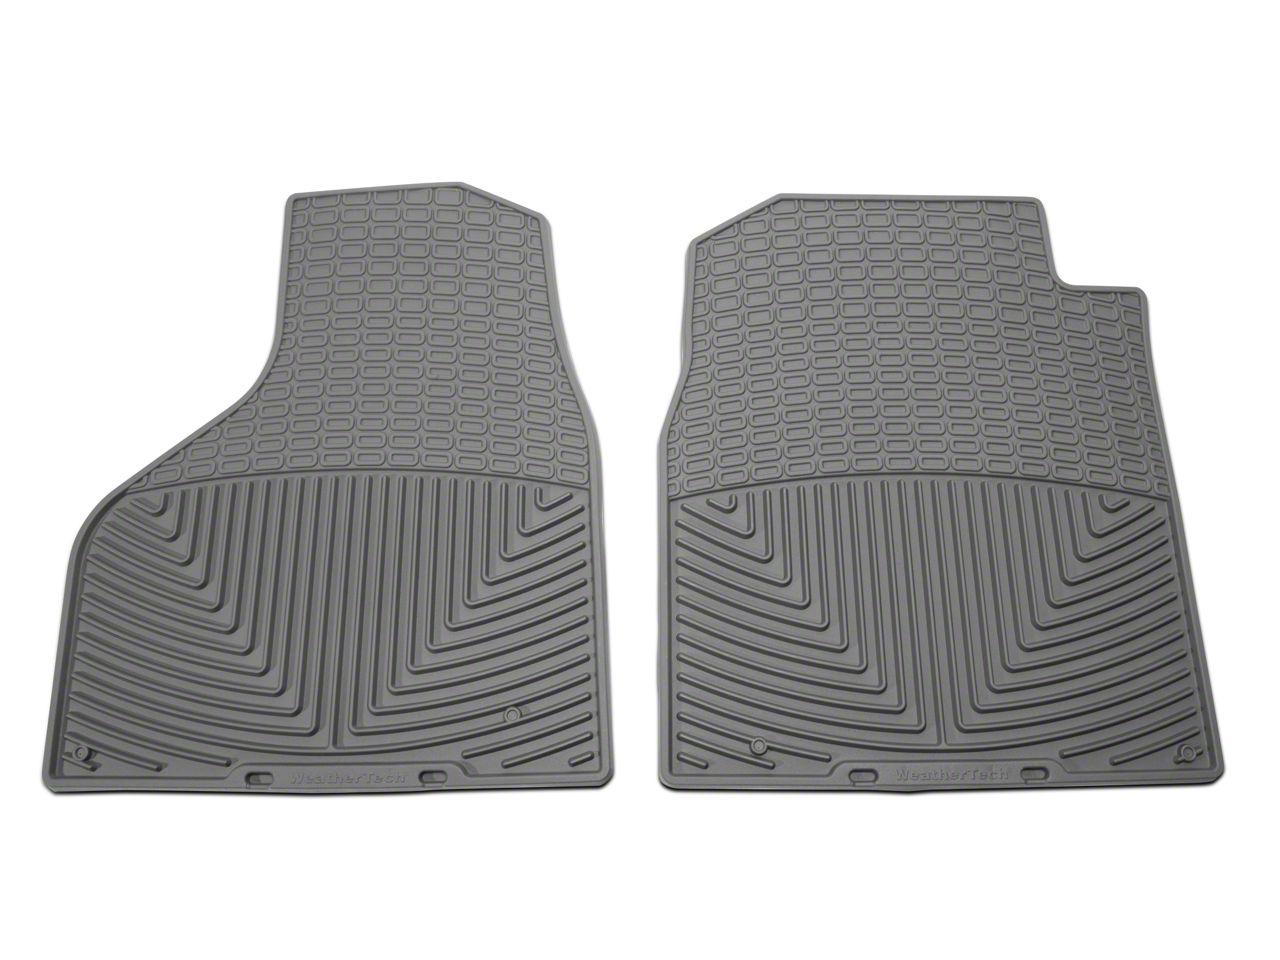 Weathertech All Weather Front Floor Mats - Gray (2012 w/ Driver & Passenger Side Floor Hooks; 13-18 All)